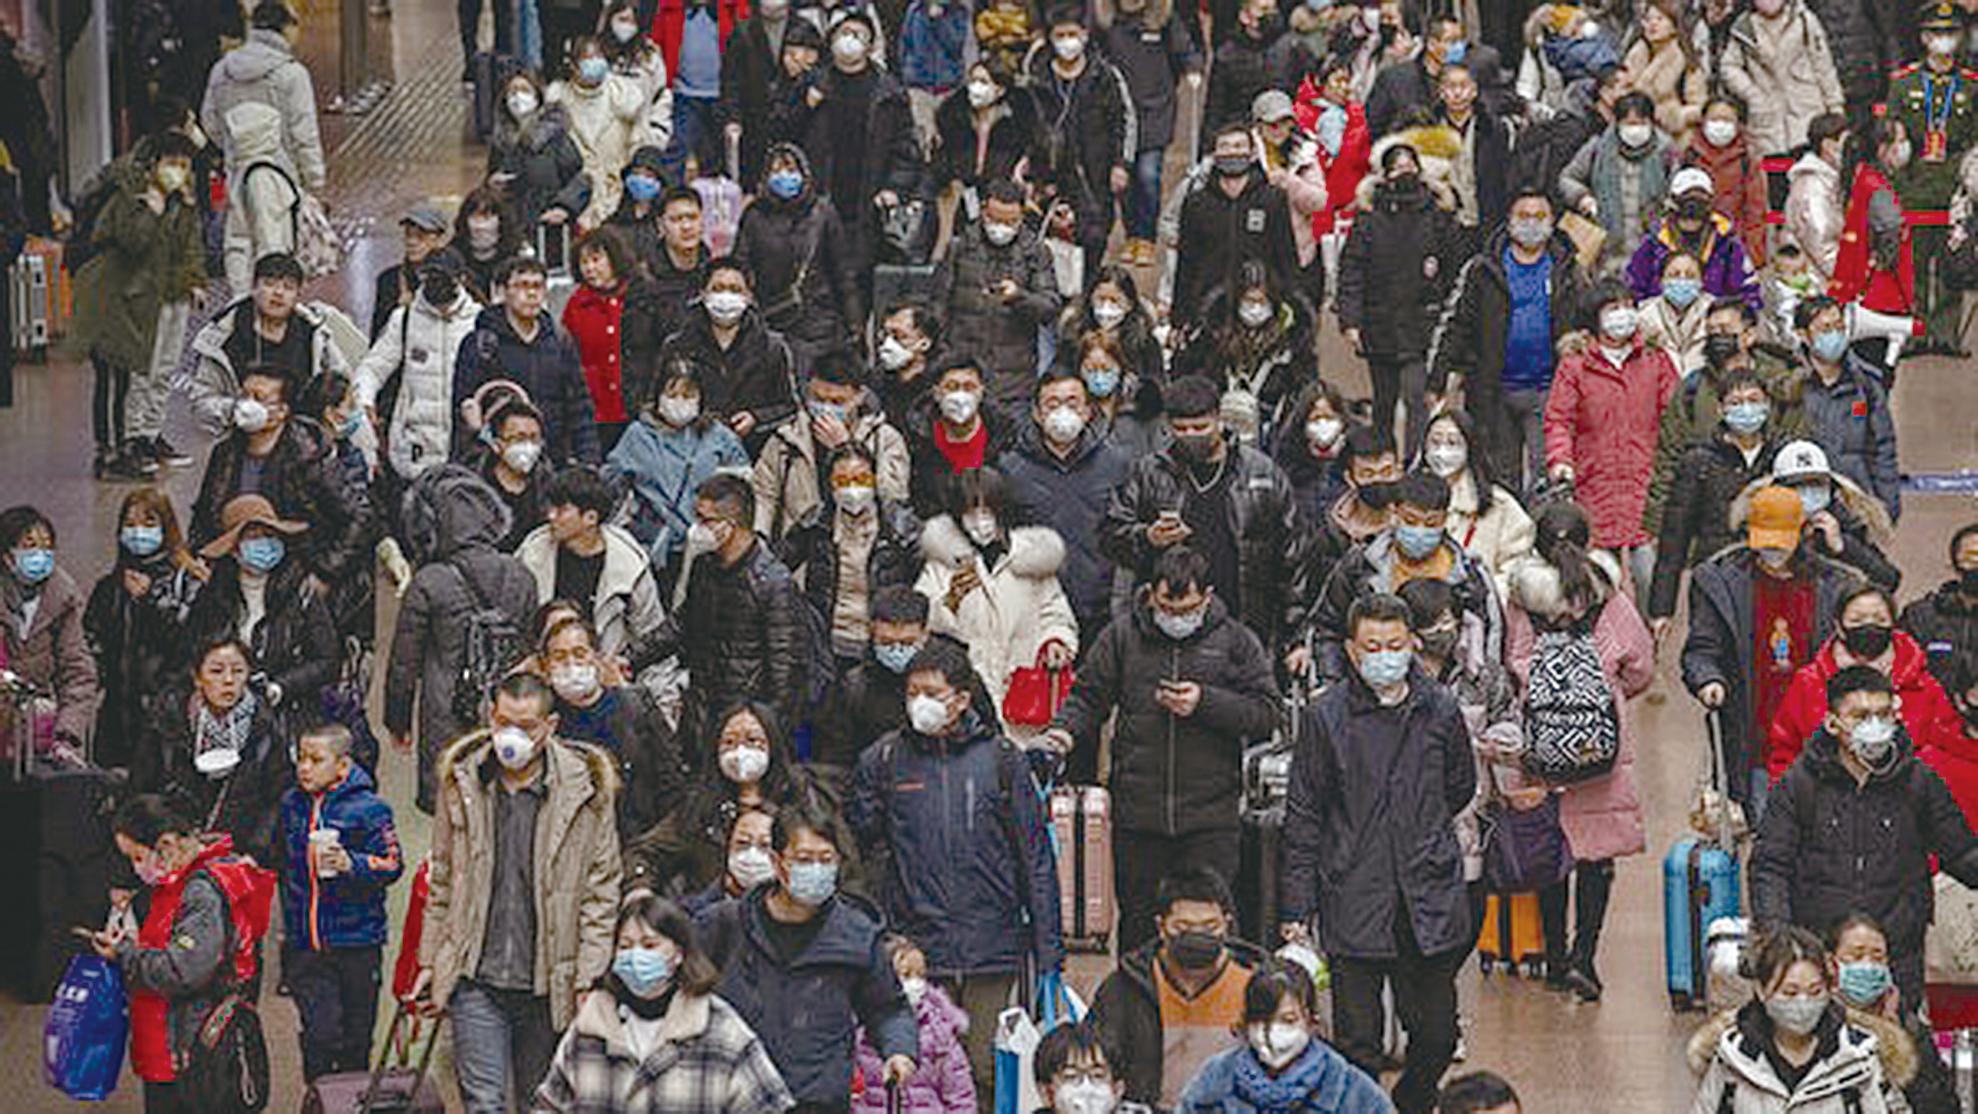 避免感染中共病毒,人人戴口罩自保。 (Kevin Frayer/Getty Images)